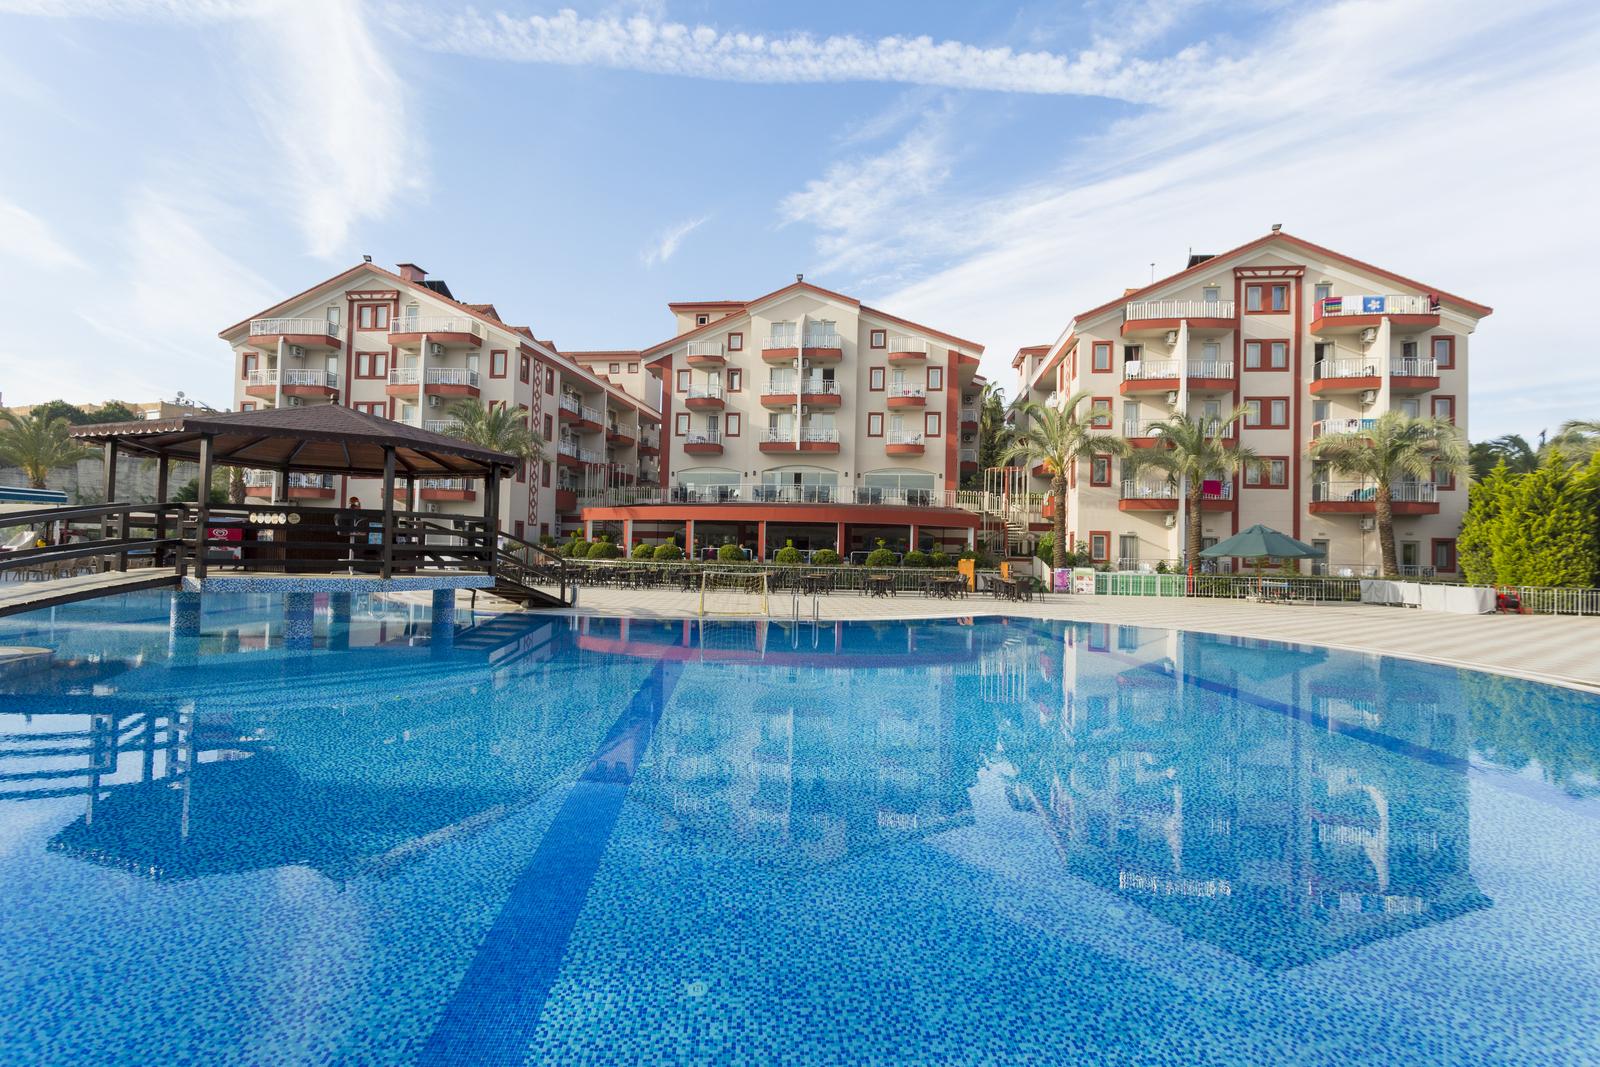 Hane_Hotels_Fotograf_cekimi-010